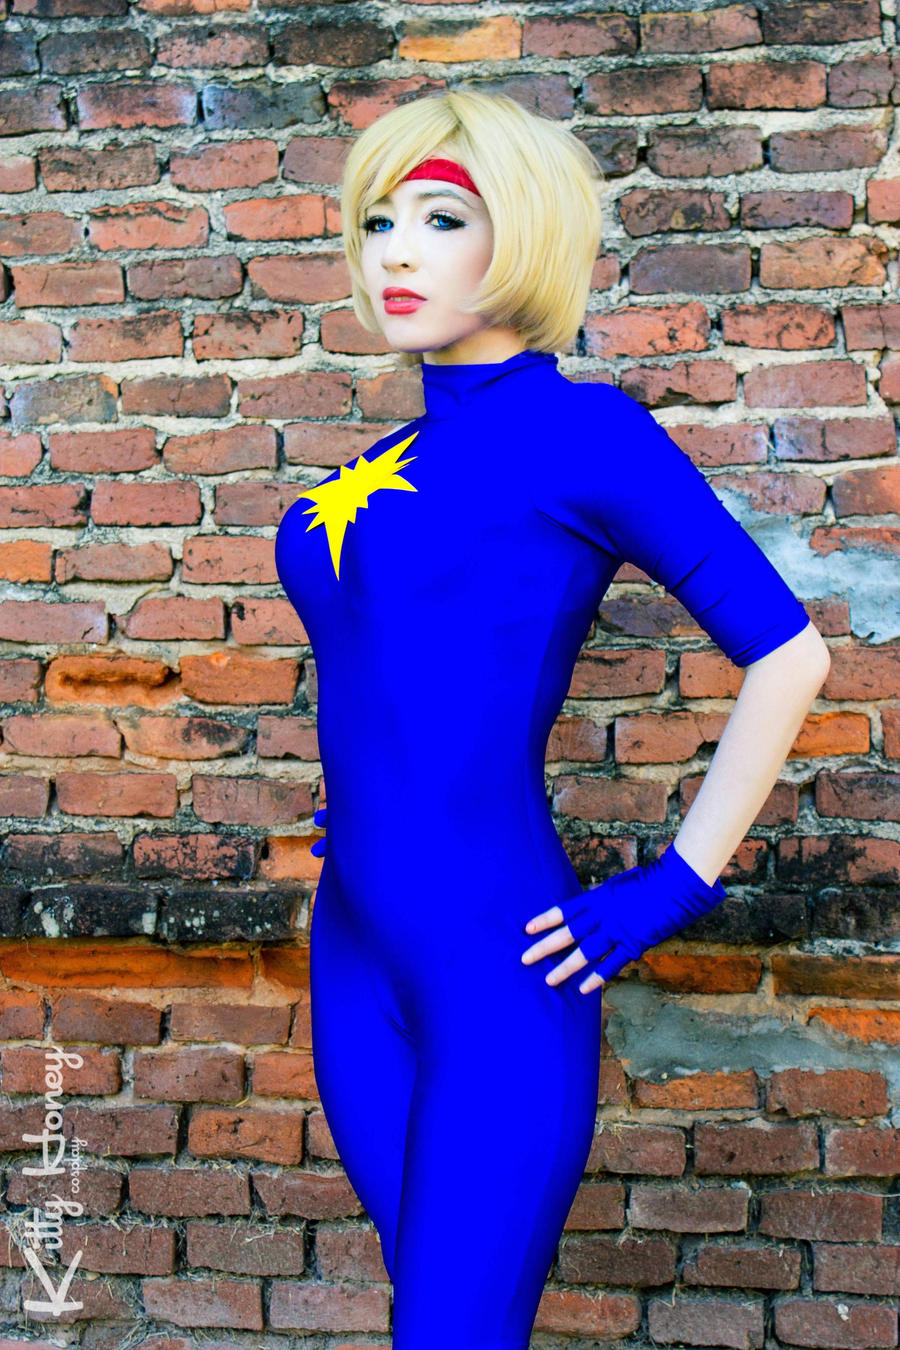 Dazzler Cosplay 03 (X-Men) by Kitty-Honey on DeviantArt